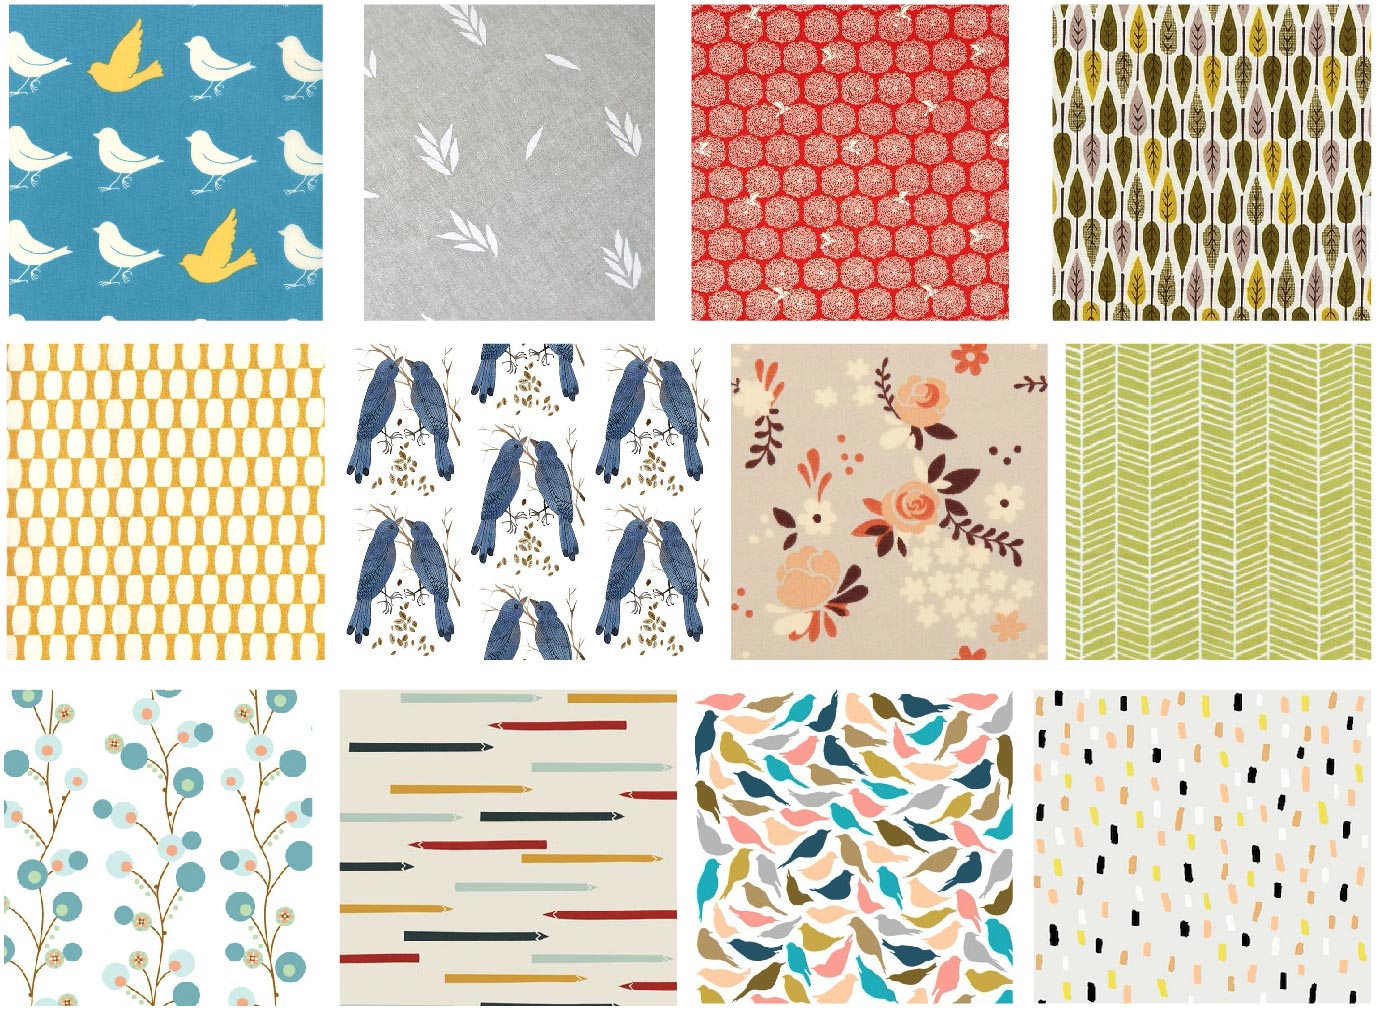 Compagnie-M_mailbox_surprise_series_fabrics